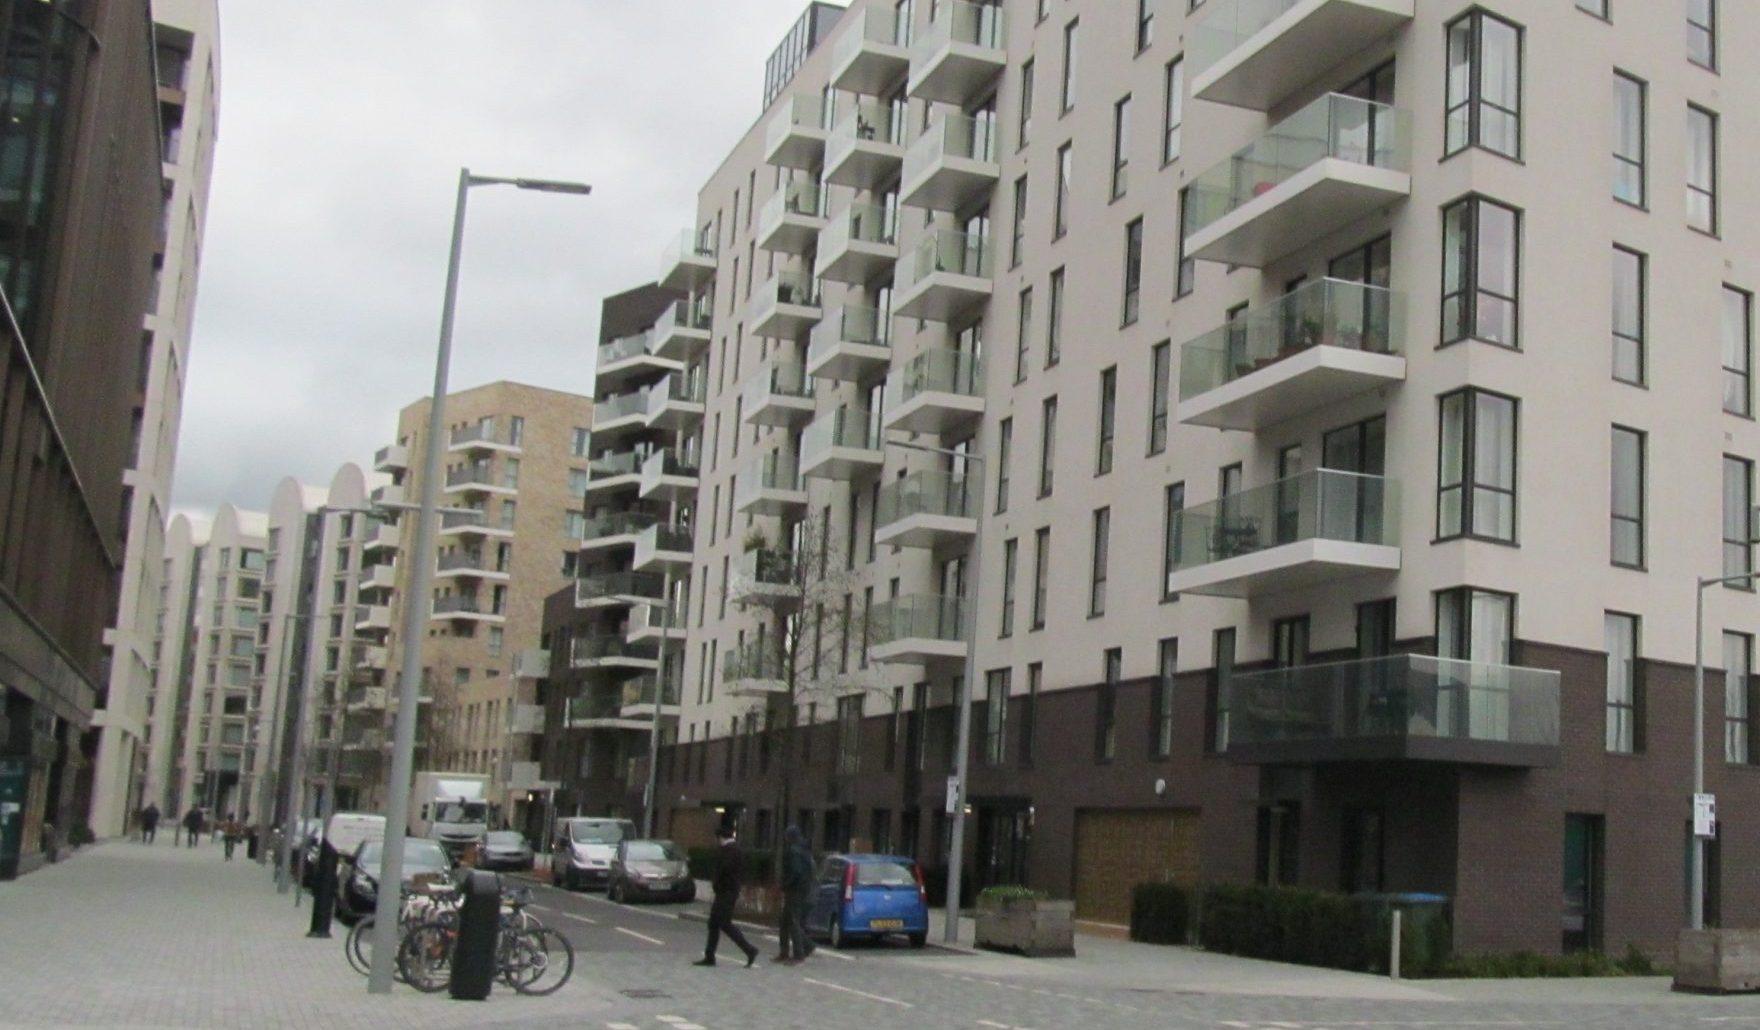 Four arrests after Greenwich stabbing victim dies